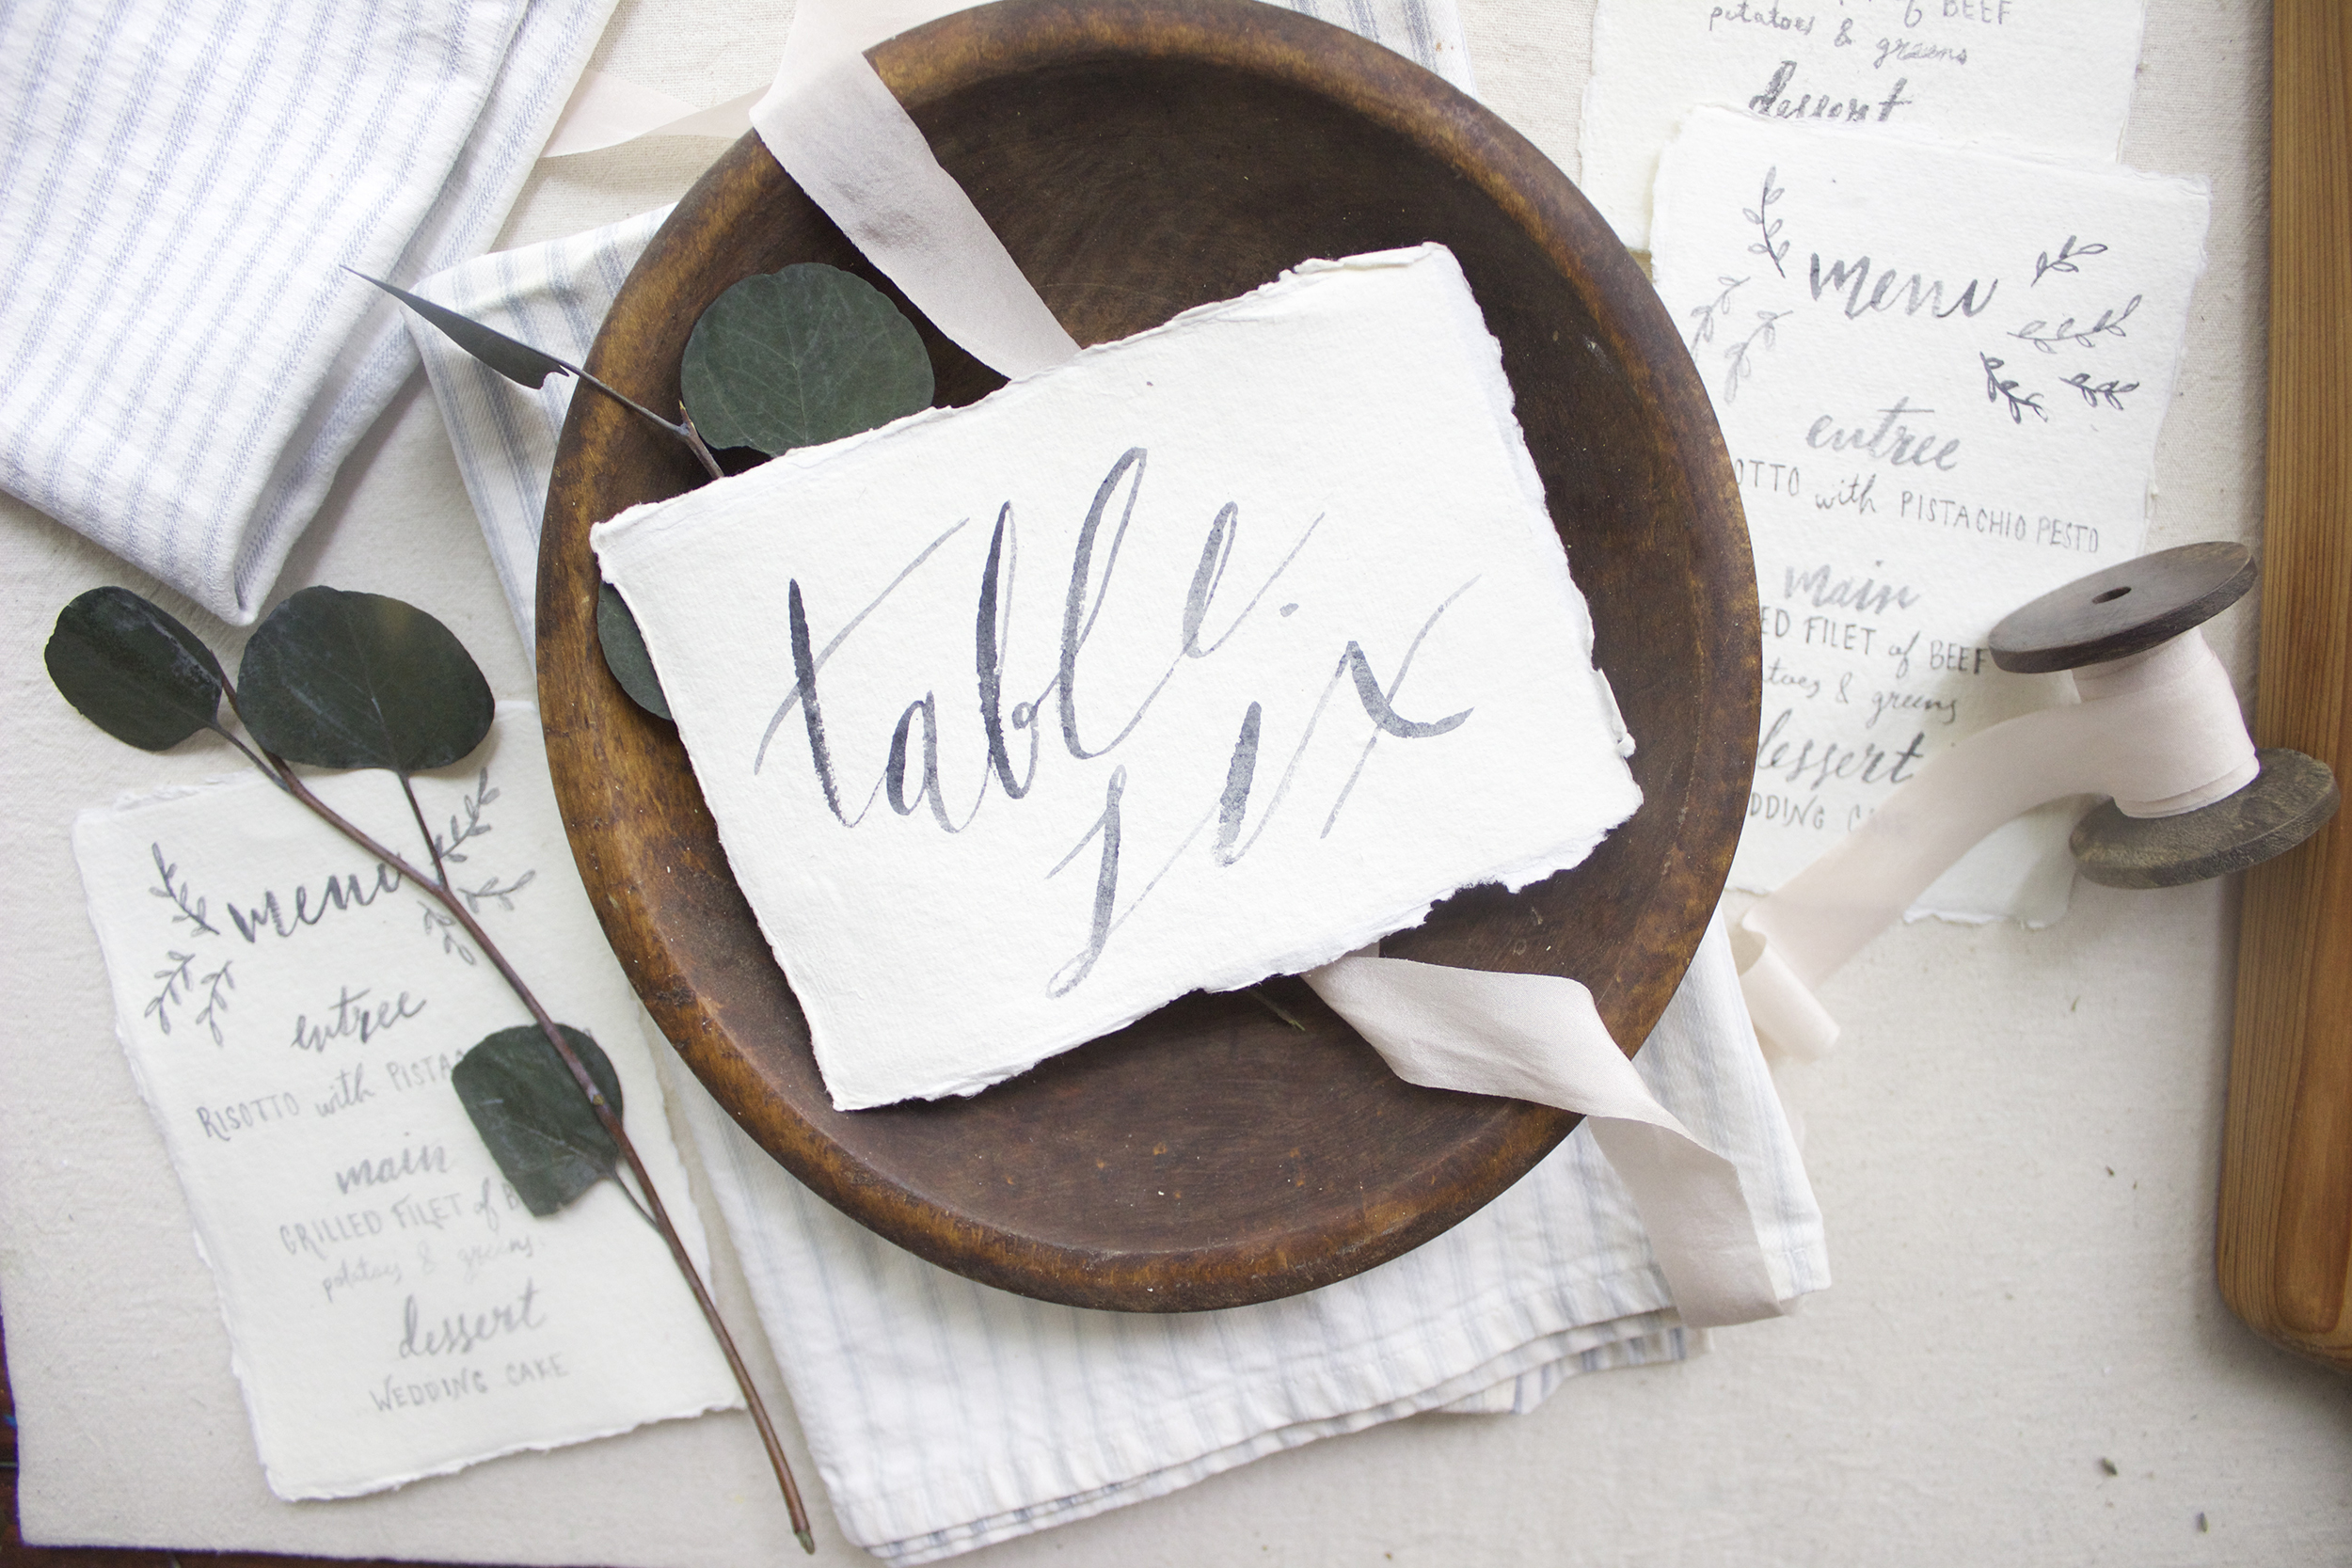 THE-little-BLUE-CHAIR-wedding-planning-tips-3.jpg